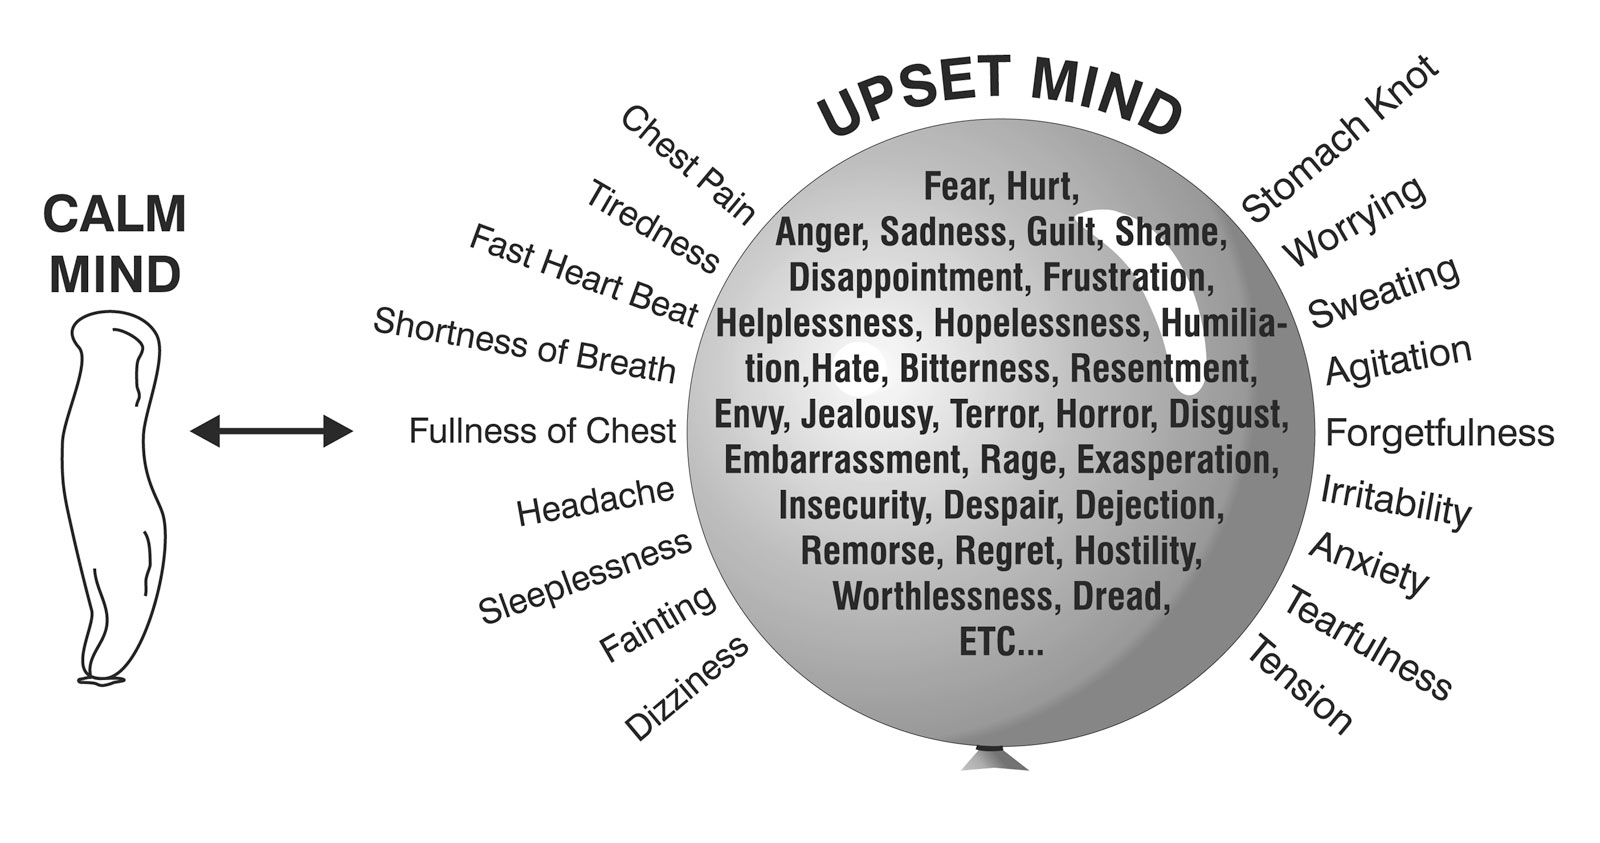 power of subconscious mind essay